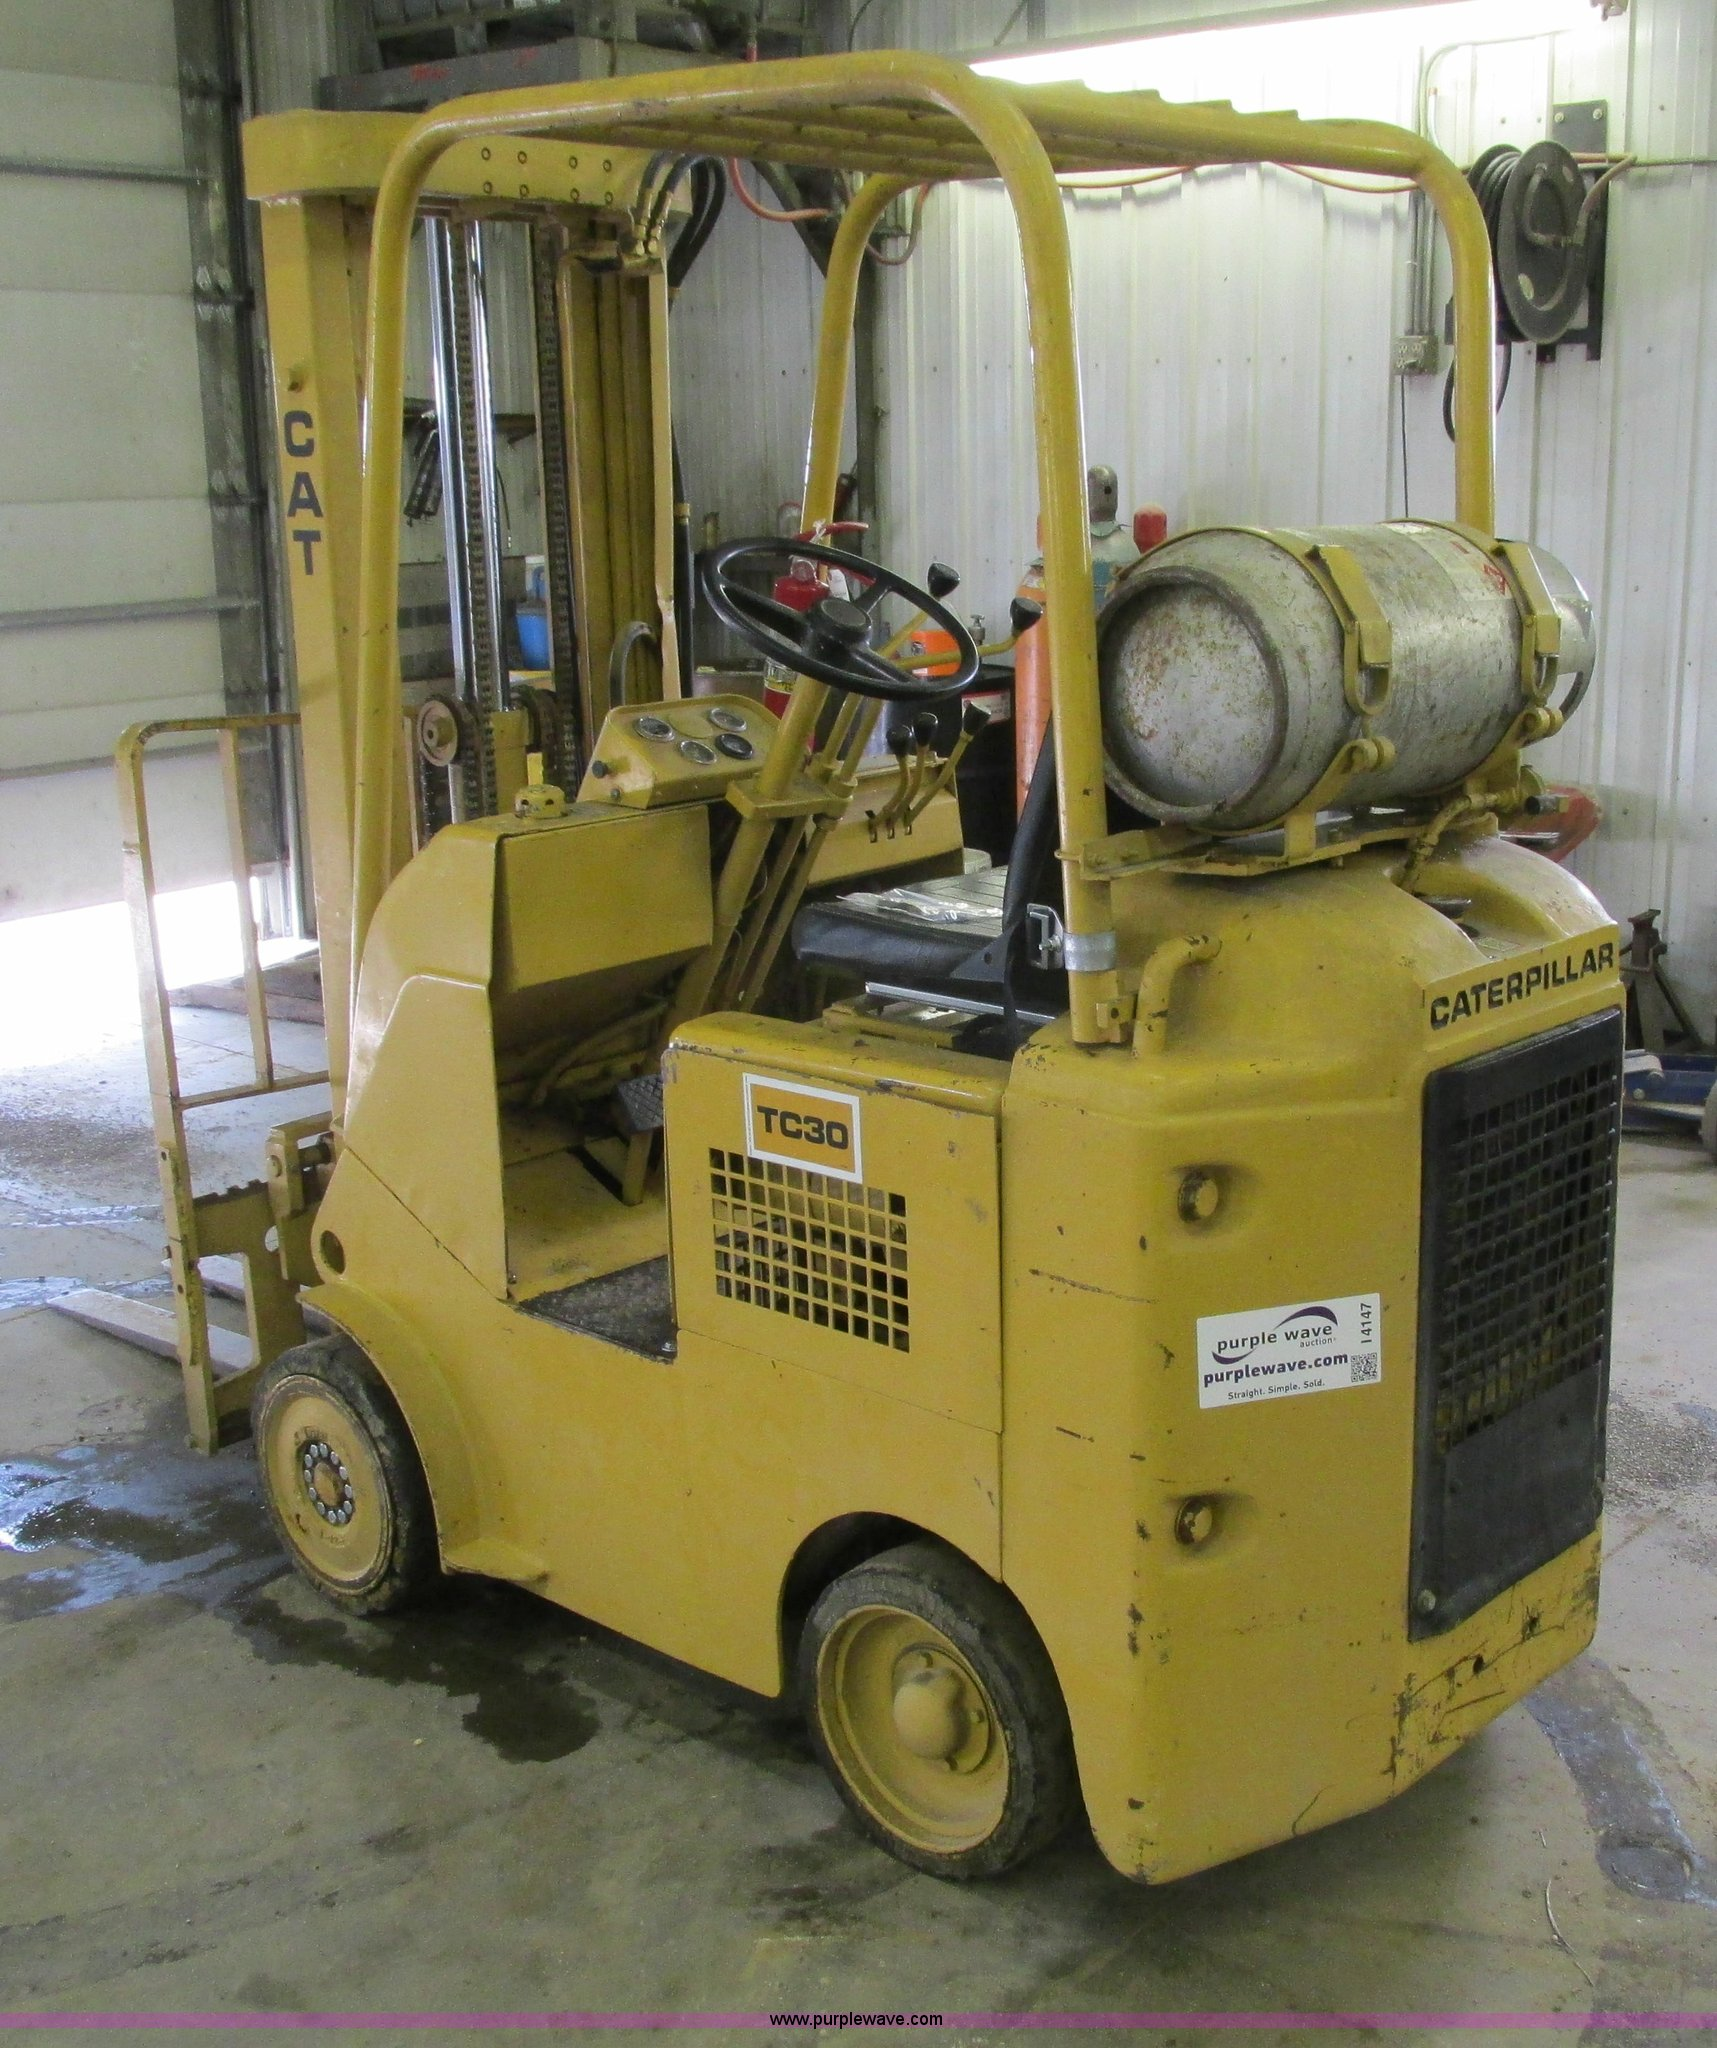 Caterpillar TC30 forklift | Item I4147 | SOLD! August 6 Vehi